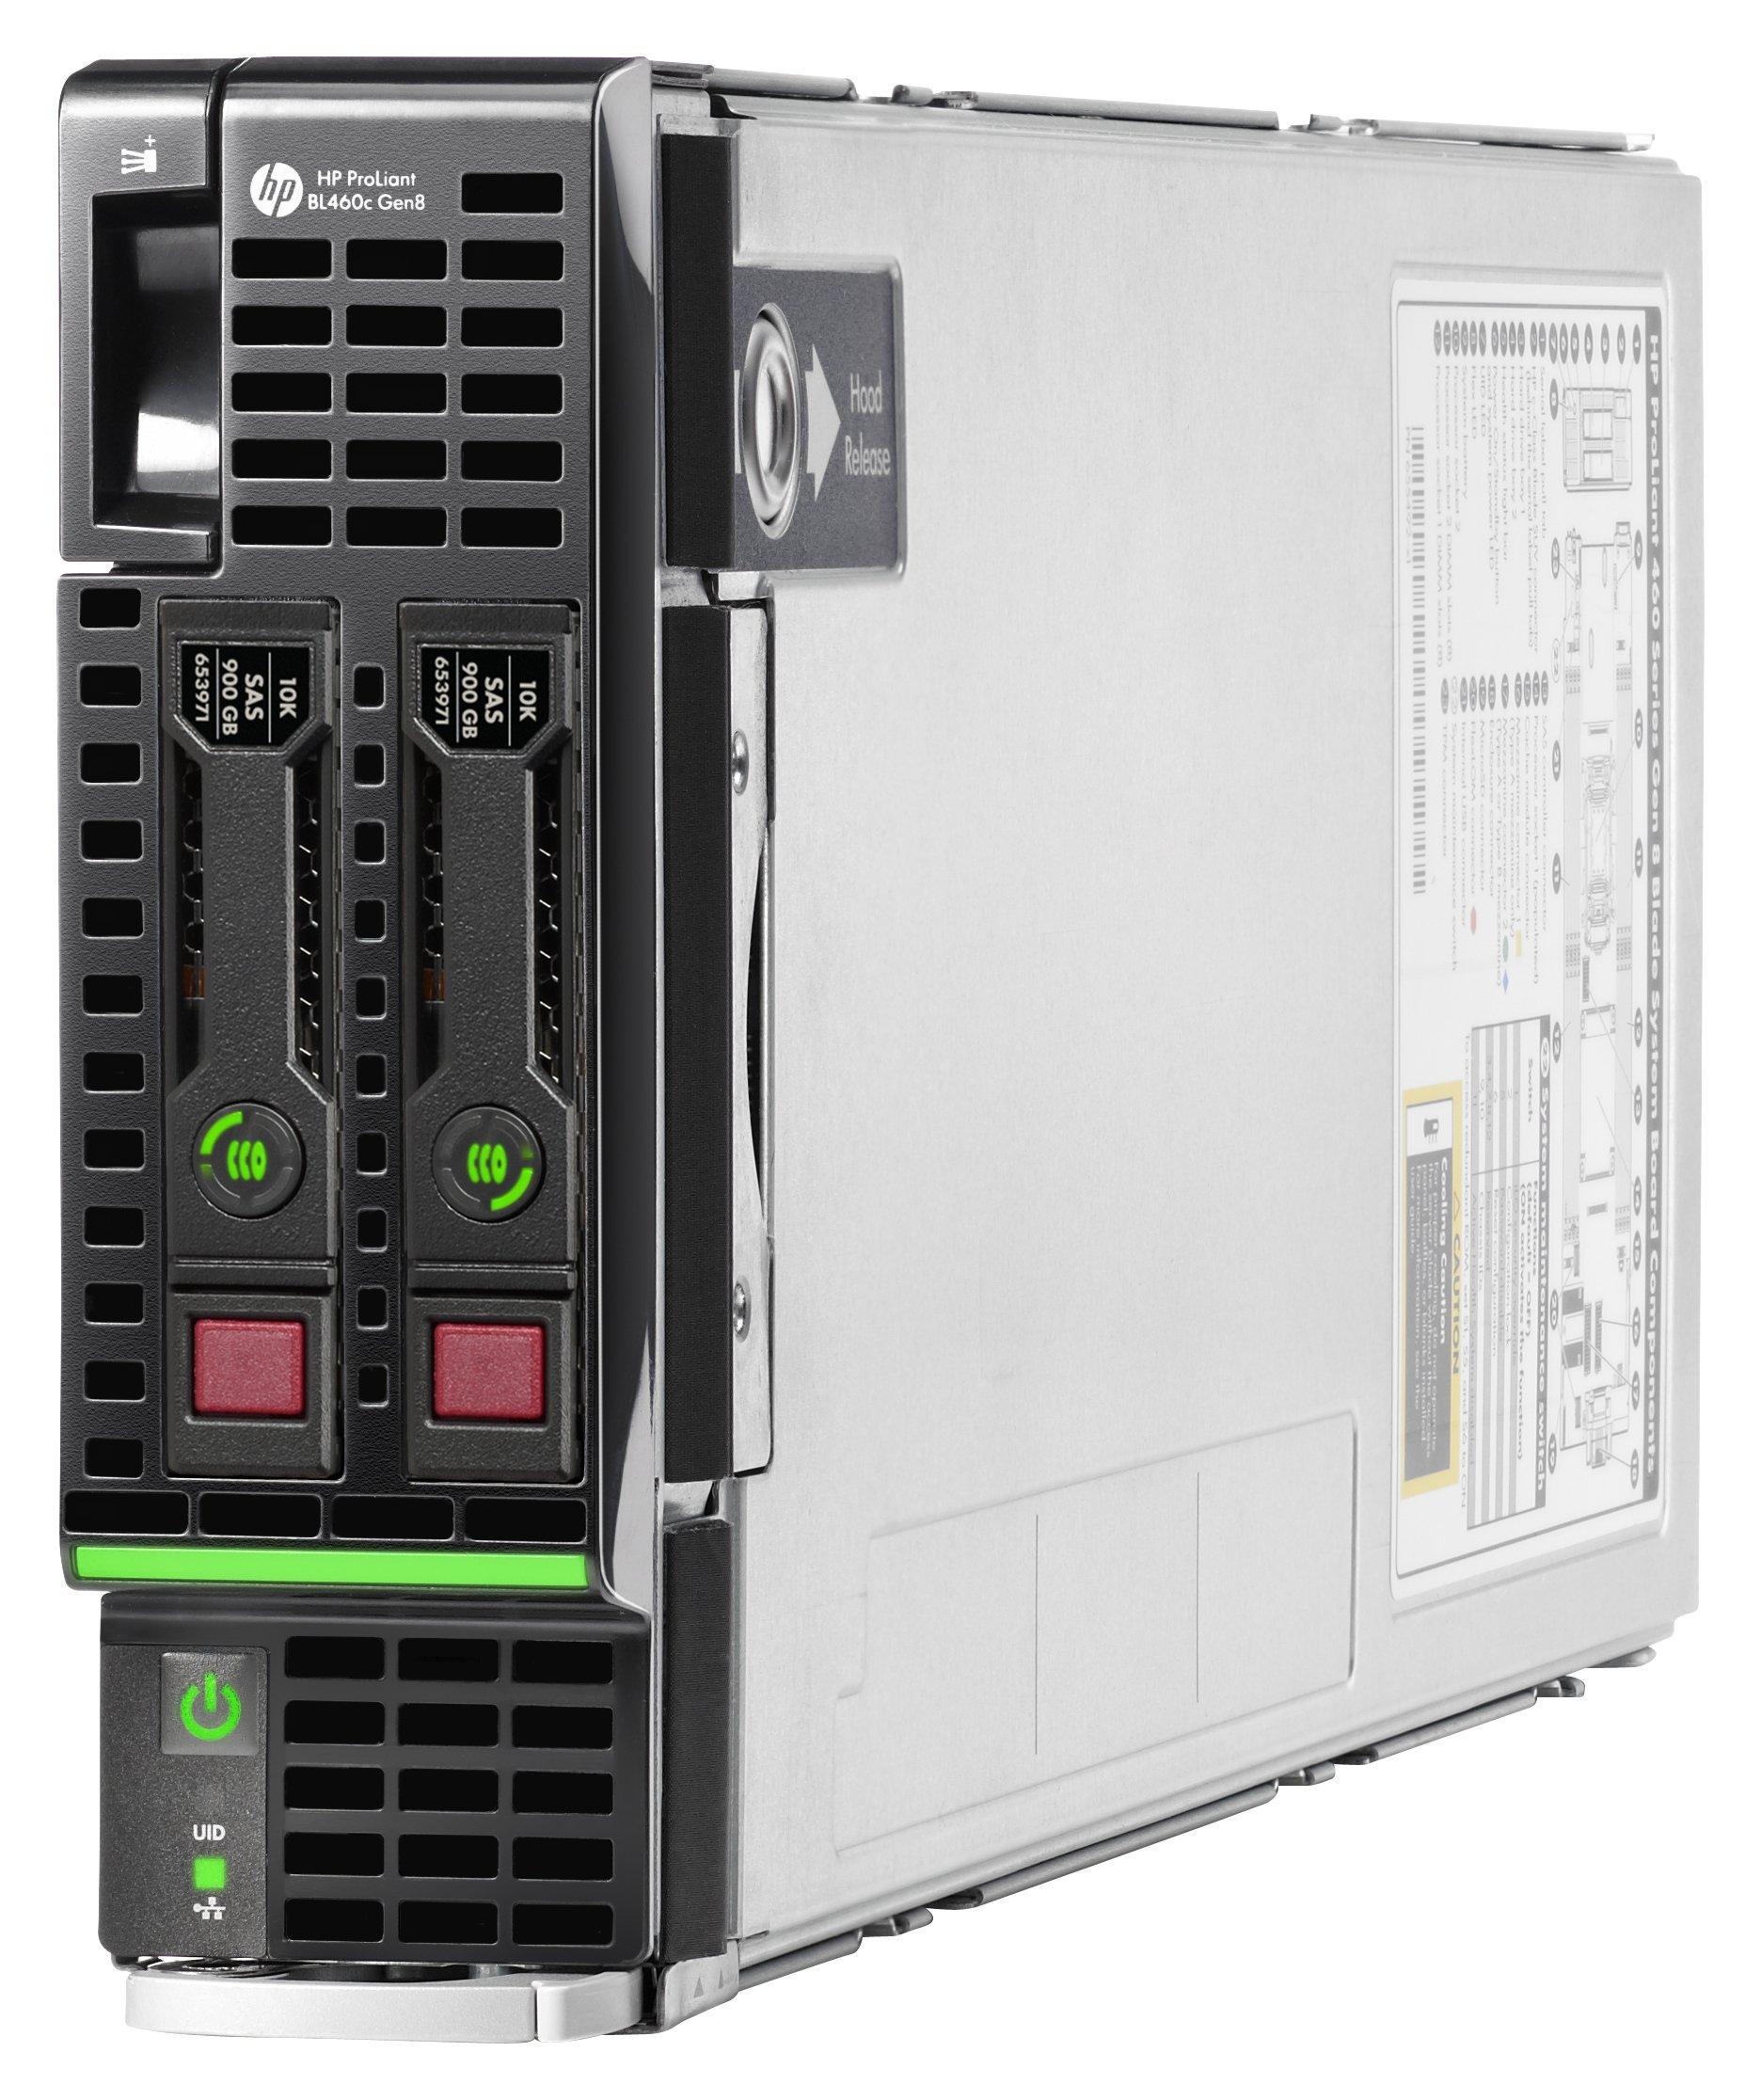 HP ProLiant BL460c Gen8 Blade Server with 2xEight-Core E5-2670 Xeon 2.6Hz + 64GB PC3-12800R RAM + 2x300GB 10K SAS SFF HDD, P220i RAID, NO OS